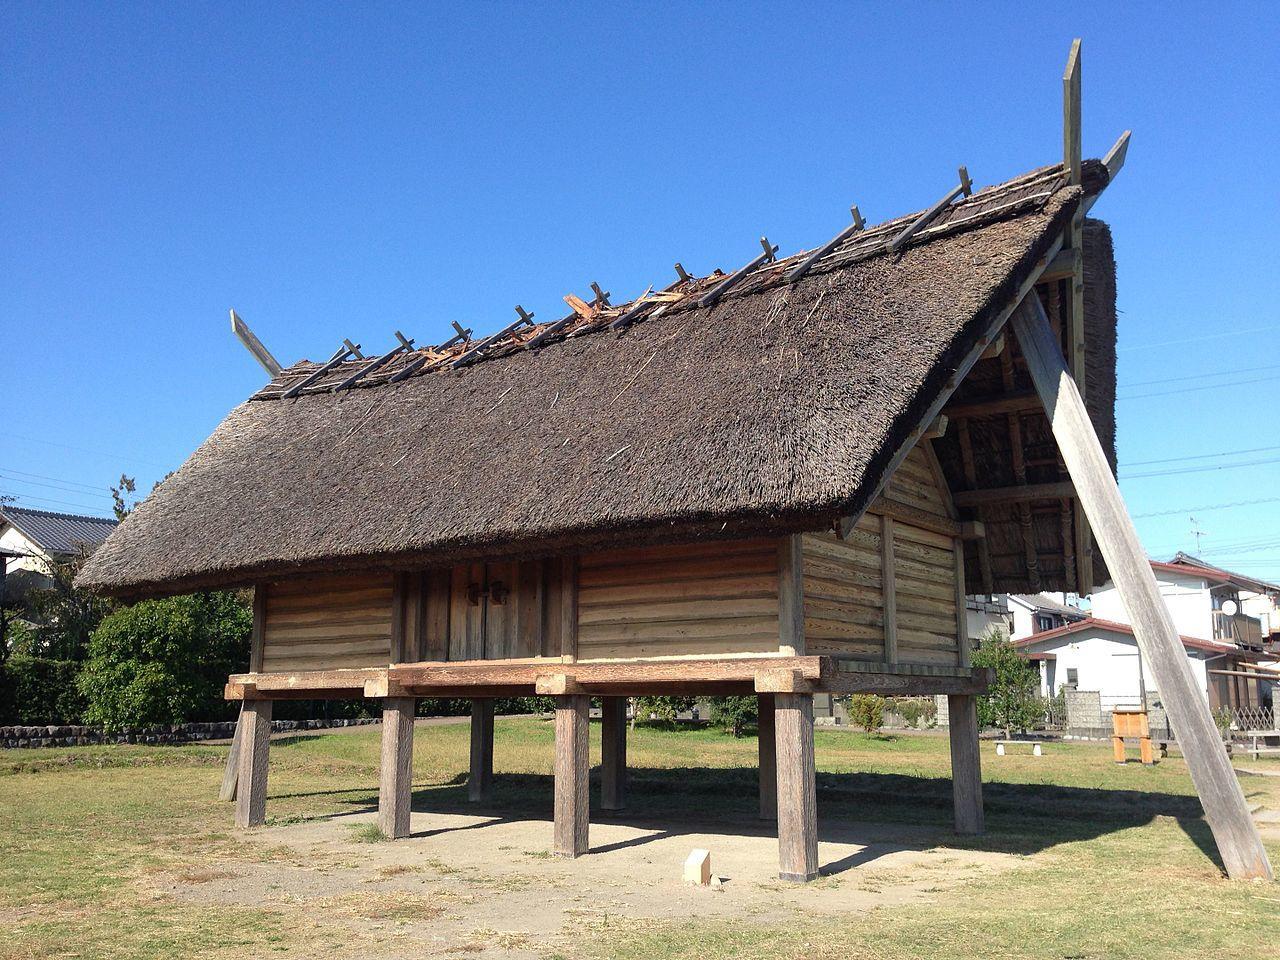 Shizuoka City Toro Museum Yayoi Period Worship Hall.